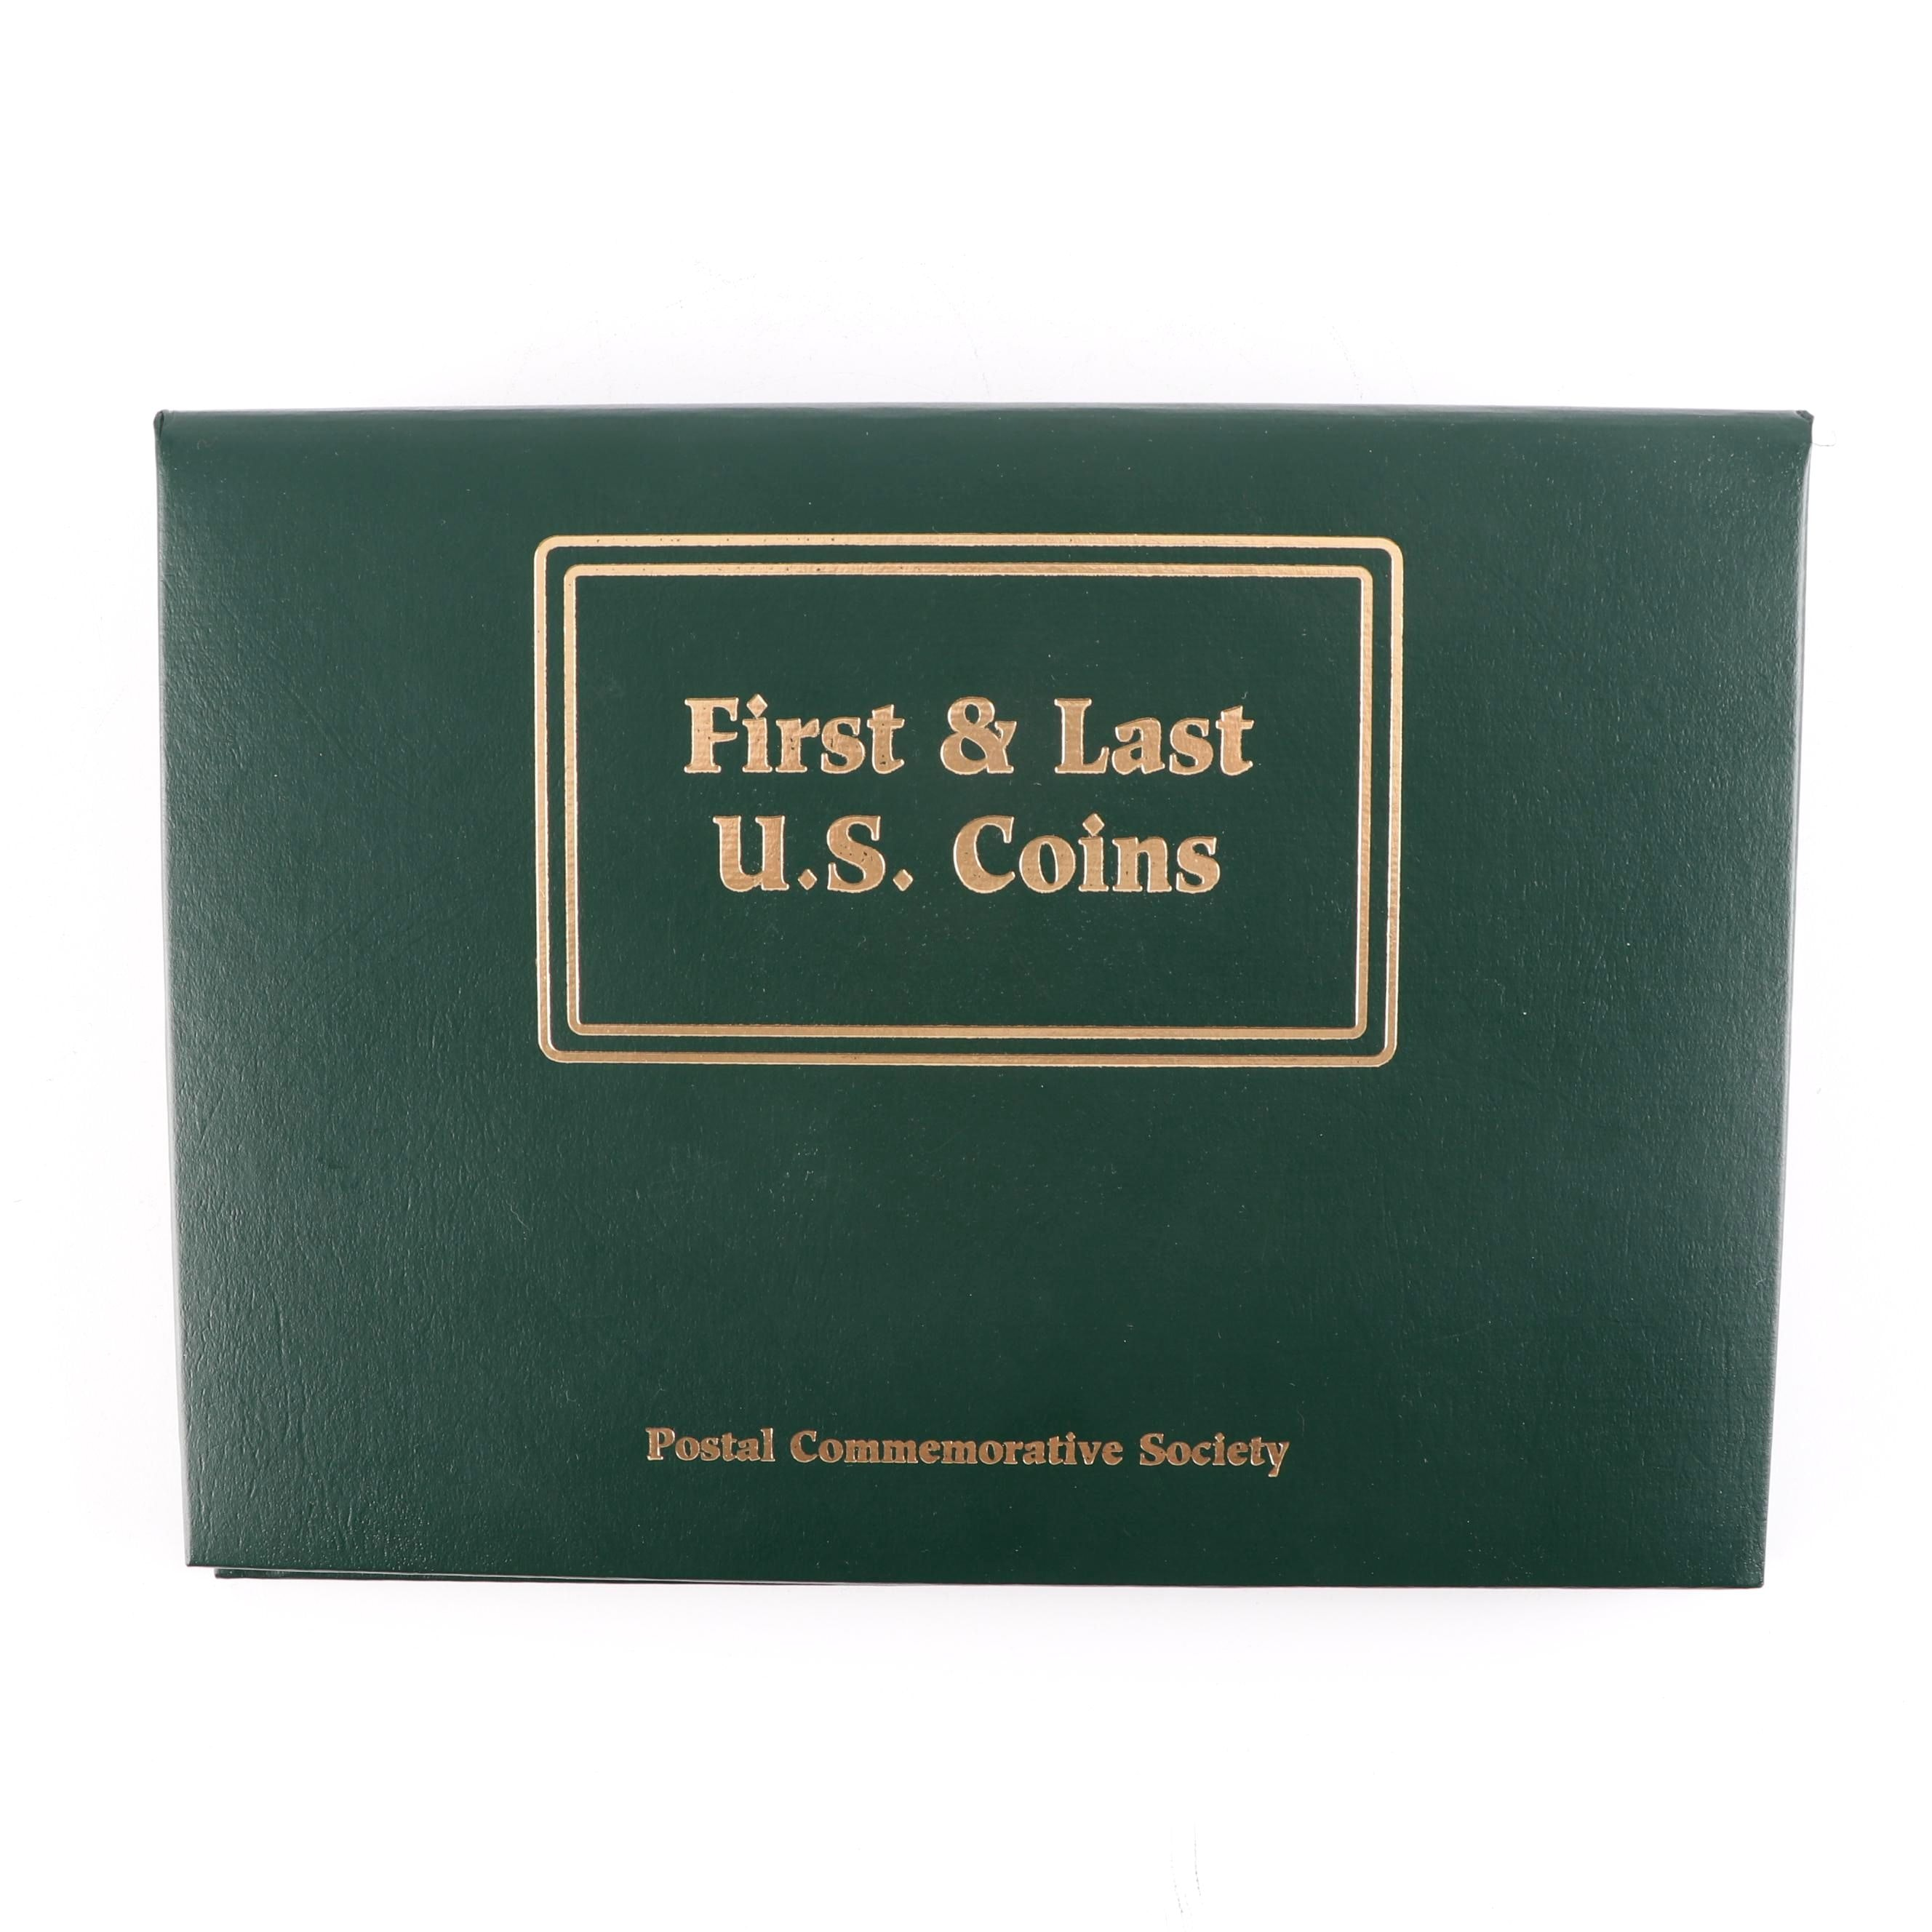 Postal Commemorative Society 18 First & Last U.S. Coins Album